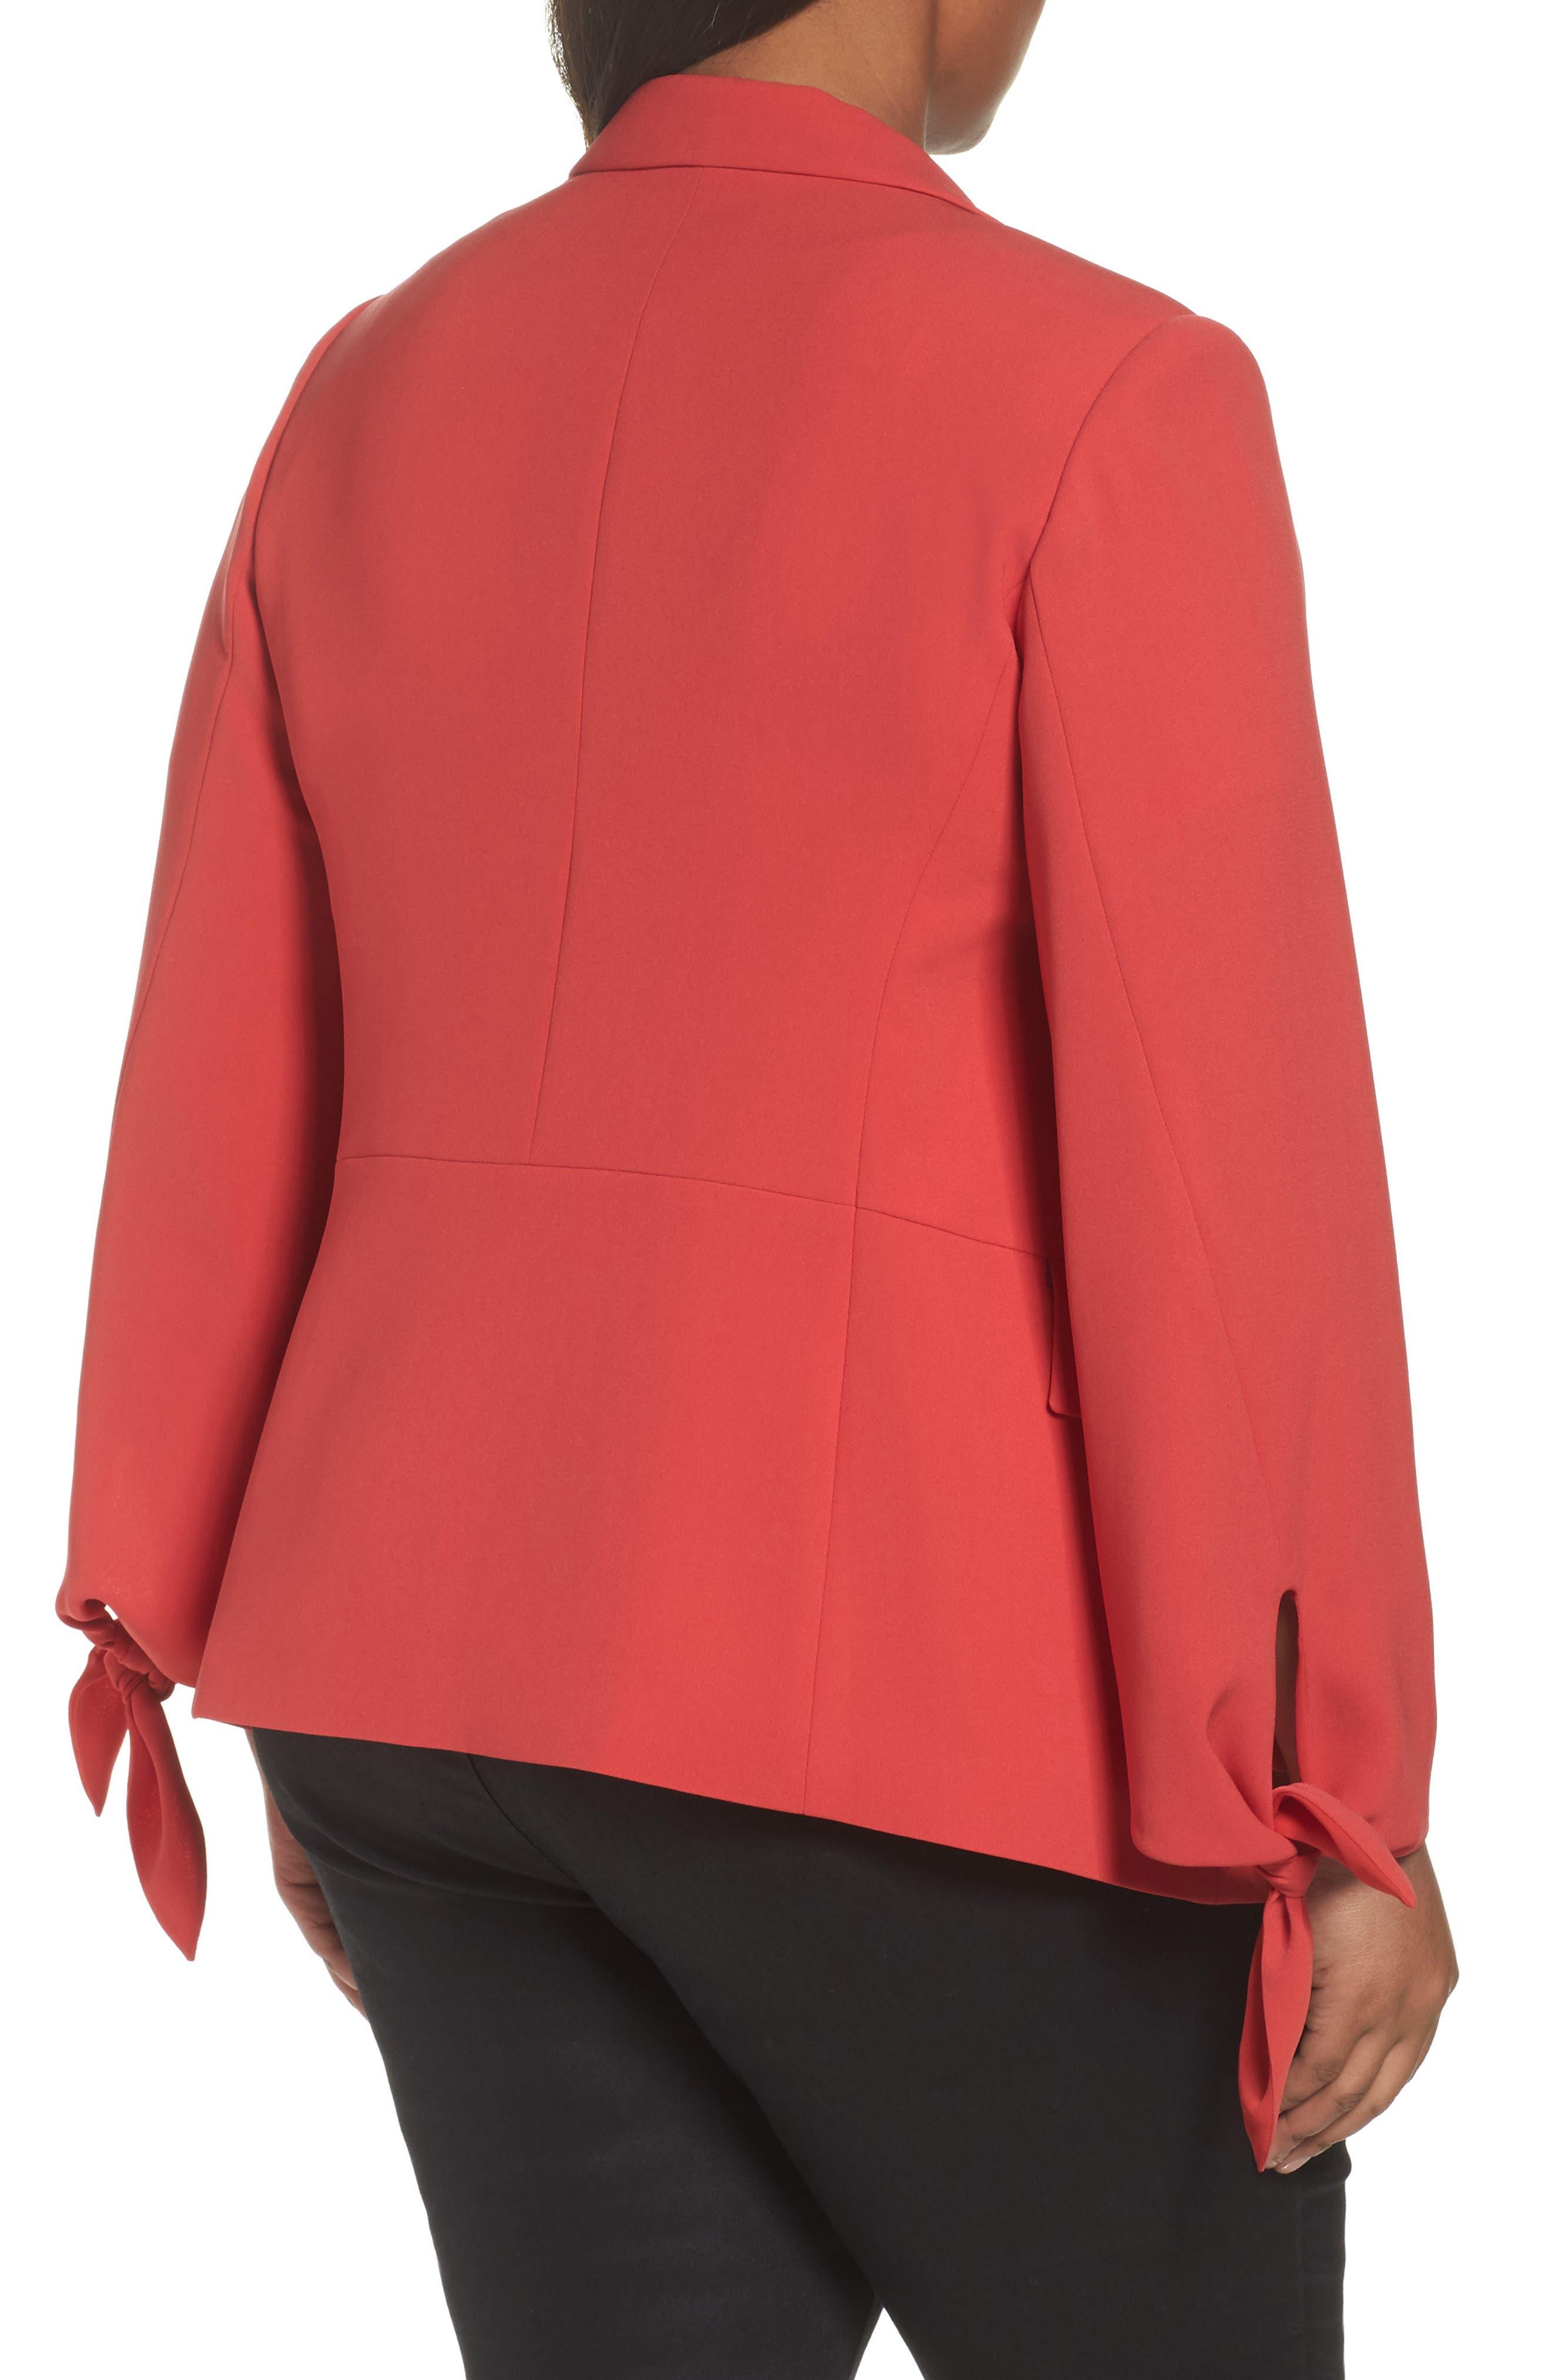 Bria Finesse Crepe Jacket,                             Alternate thumbnail 2, color,                             604